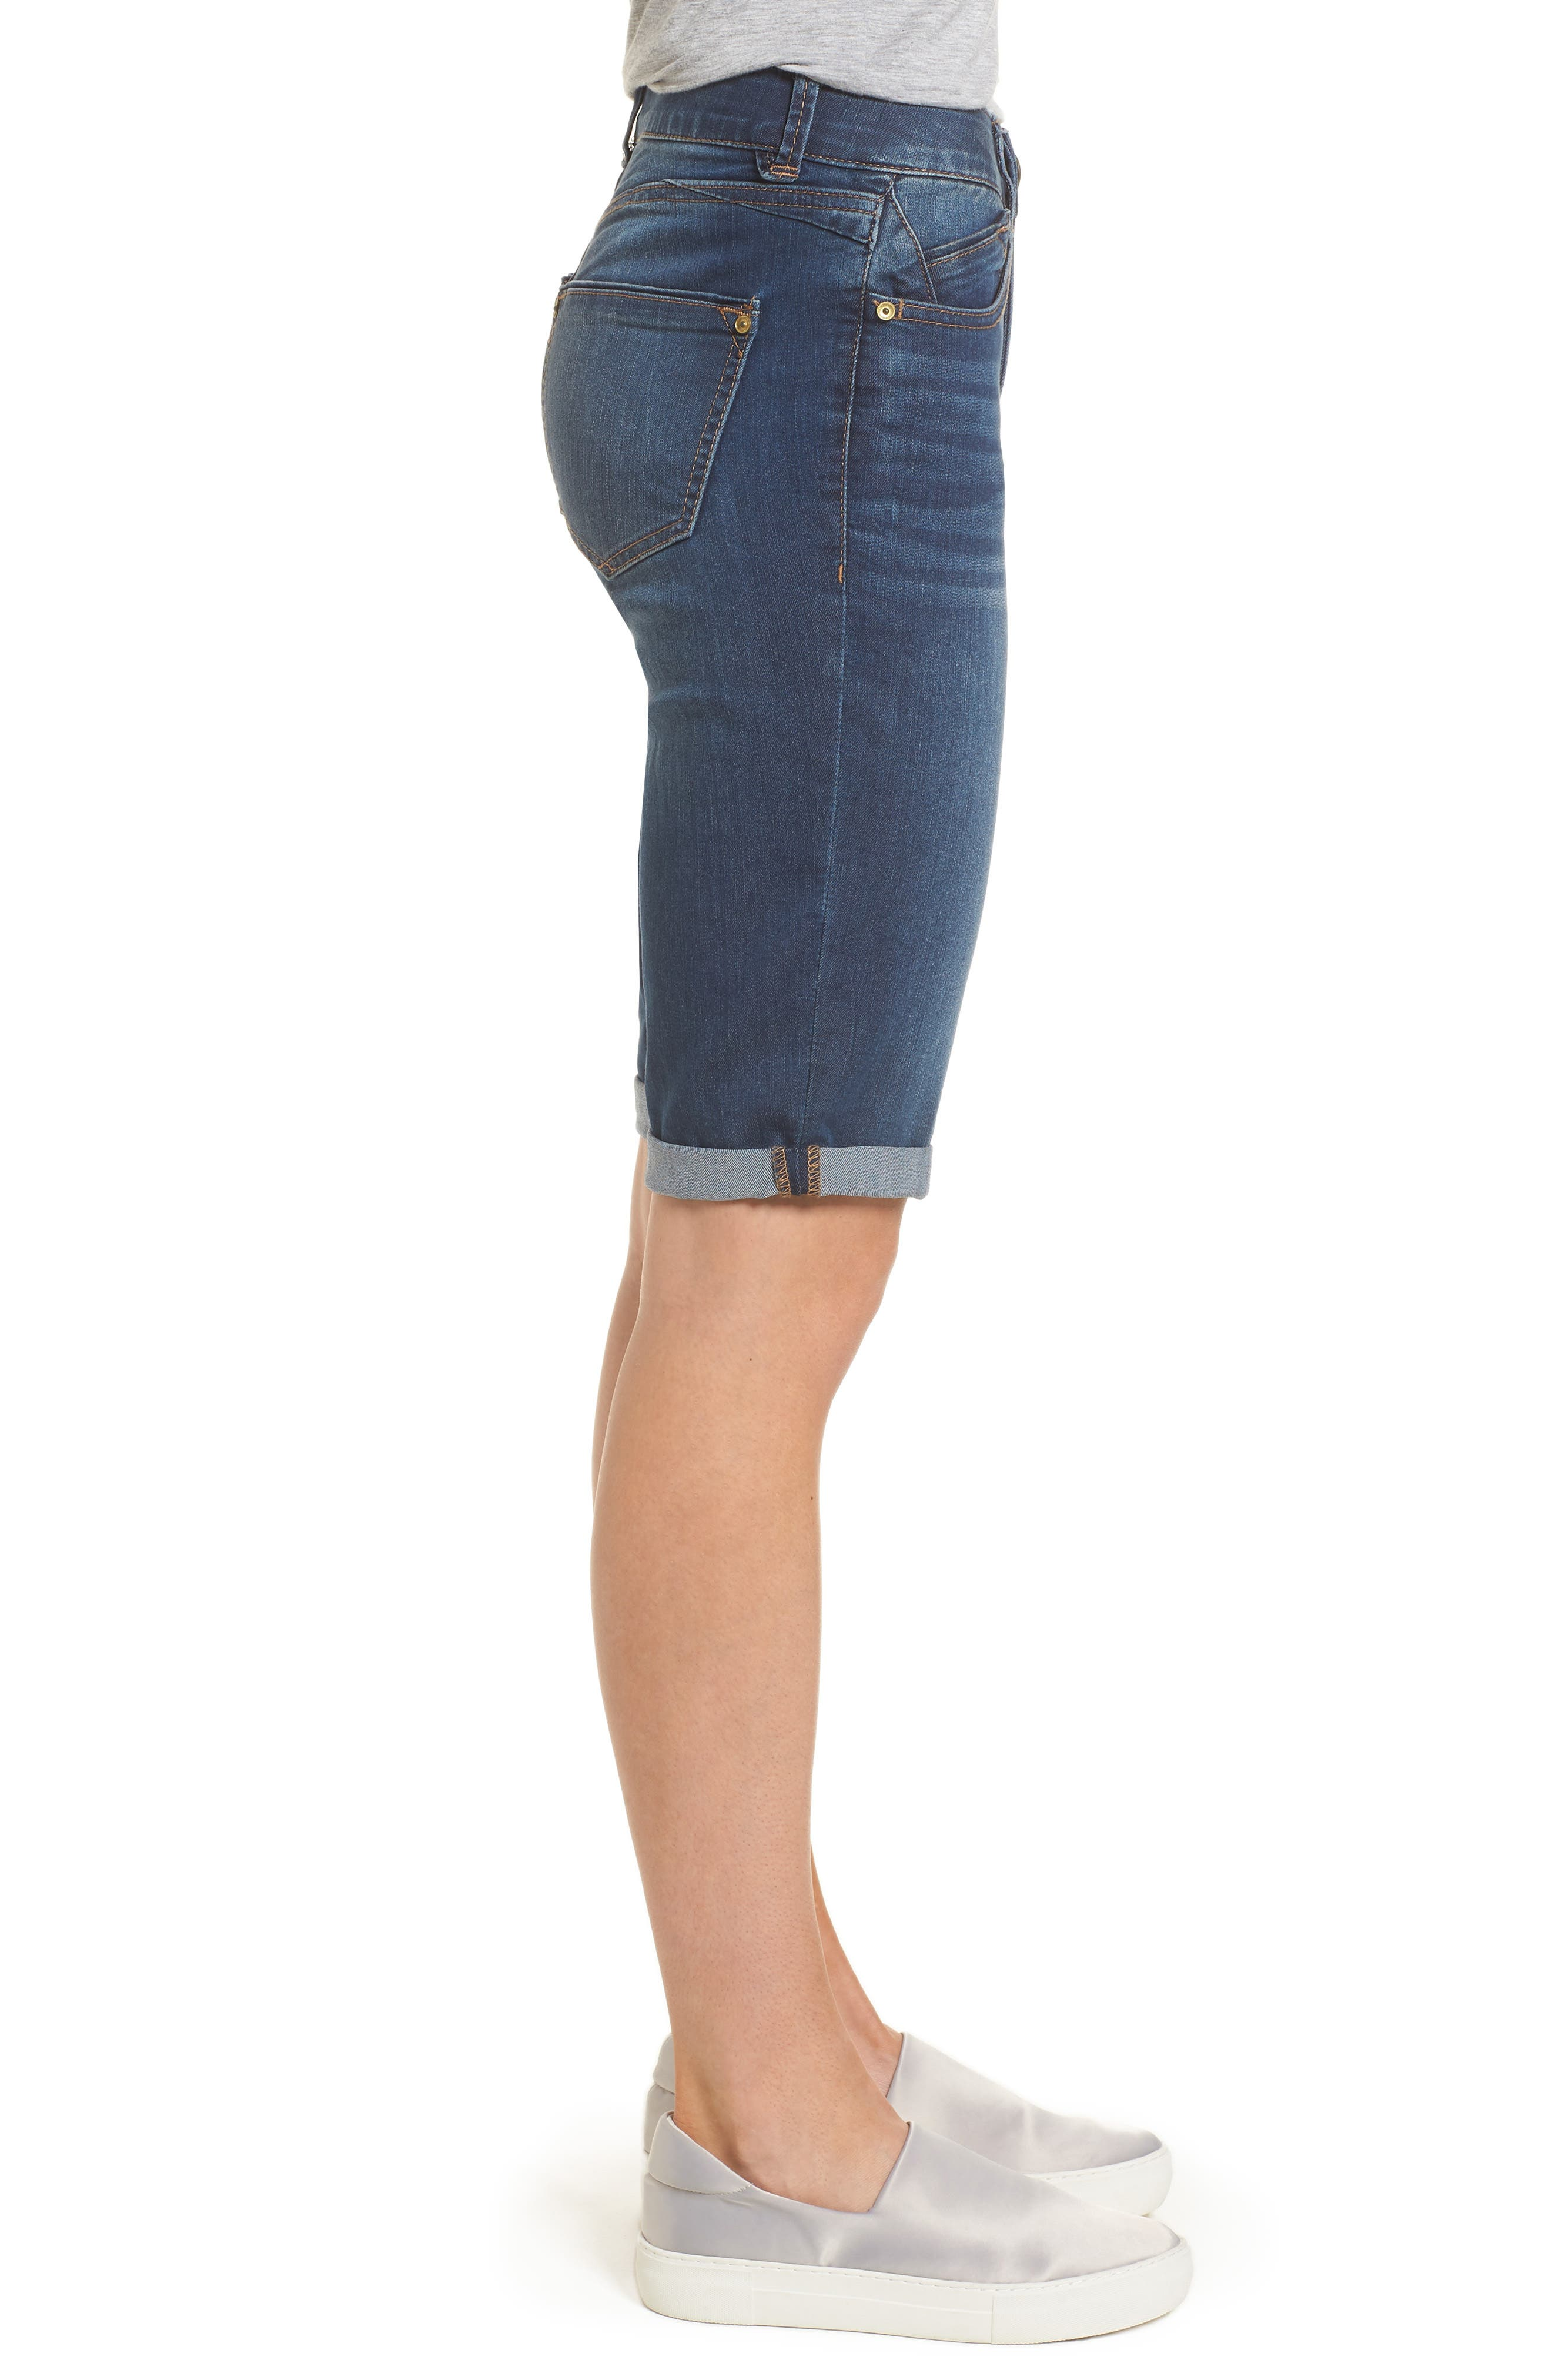 Alternate Image 3  - Wit & Wisdom Ab-solution Cuffed Denim Shorts (Nordstrom Exclusive)